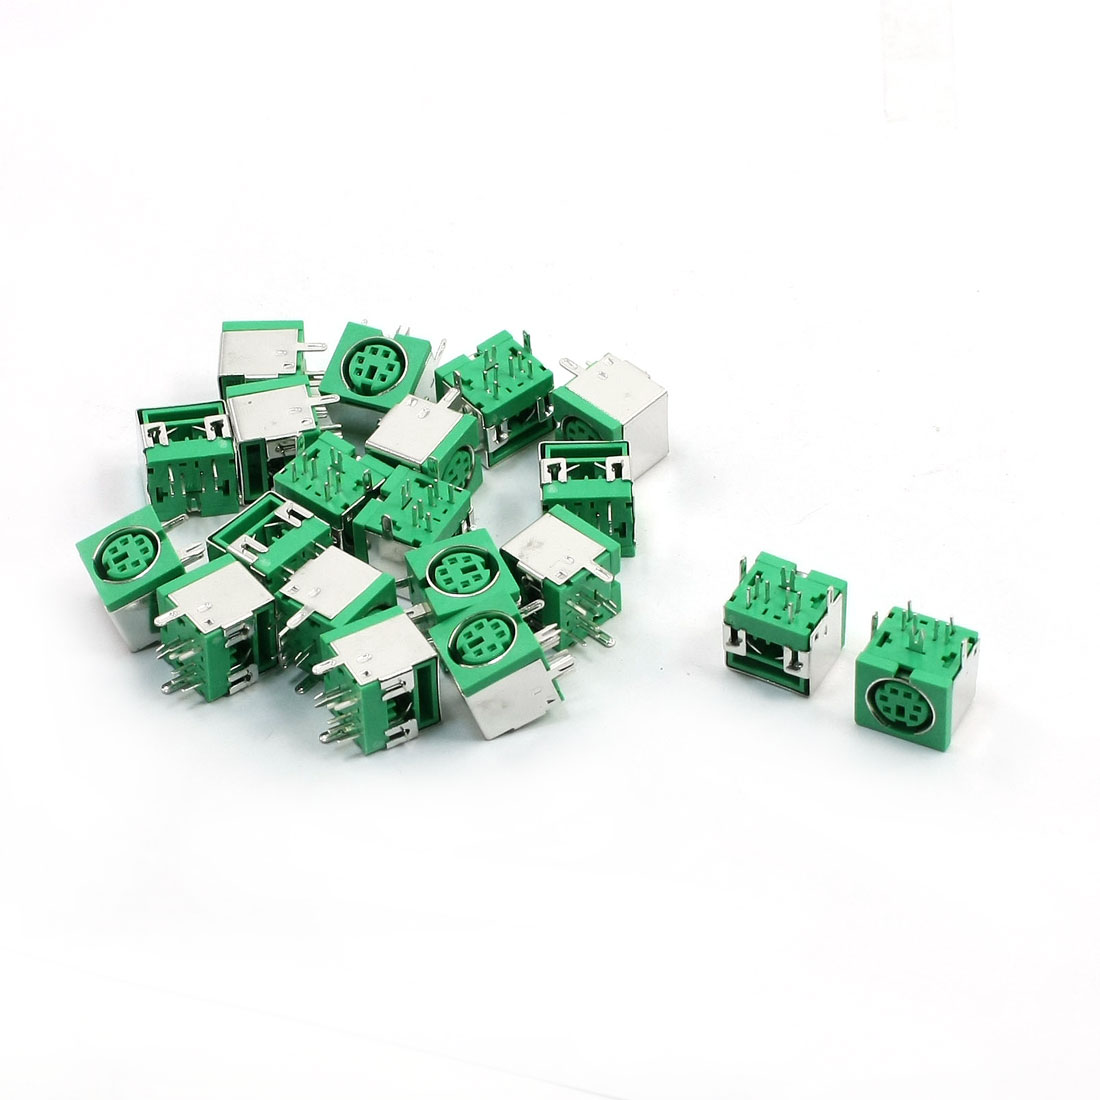 20pcs PS/2 6P Mini DIN Female PCB Mouse Keyboard Connector Green - image 1 de 1